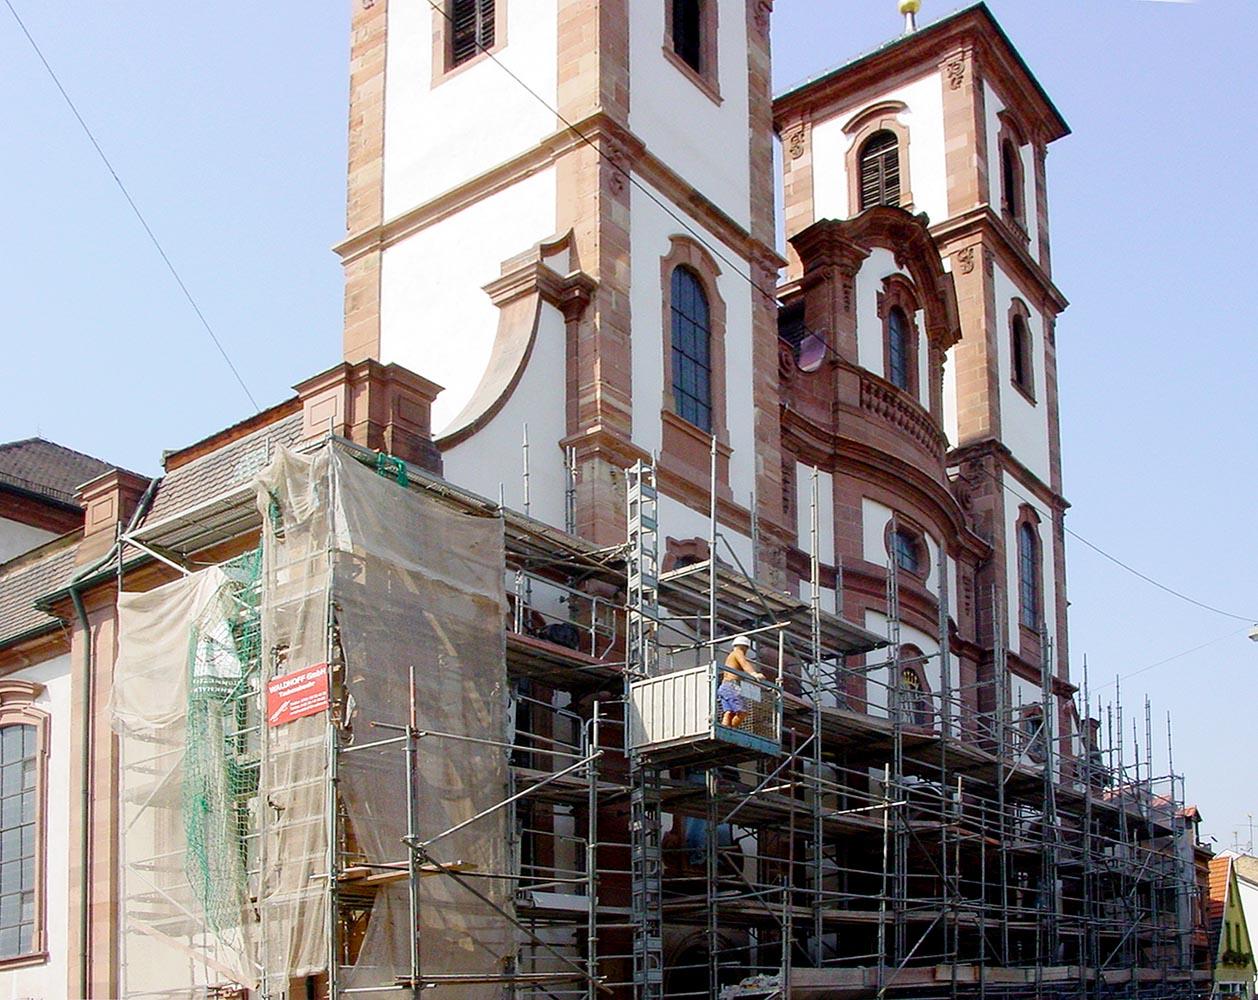 St. Jakobus, Mannheim-Neckarau